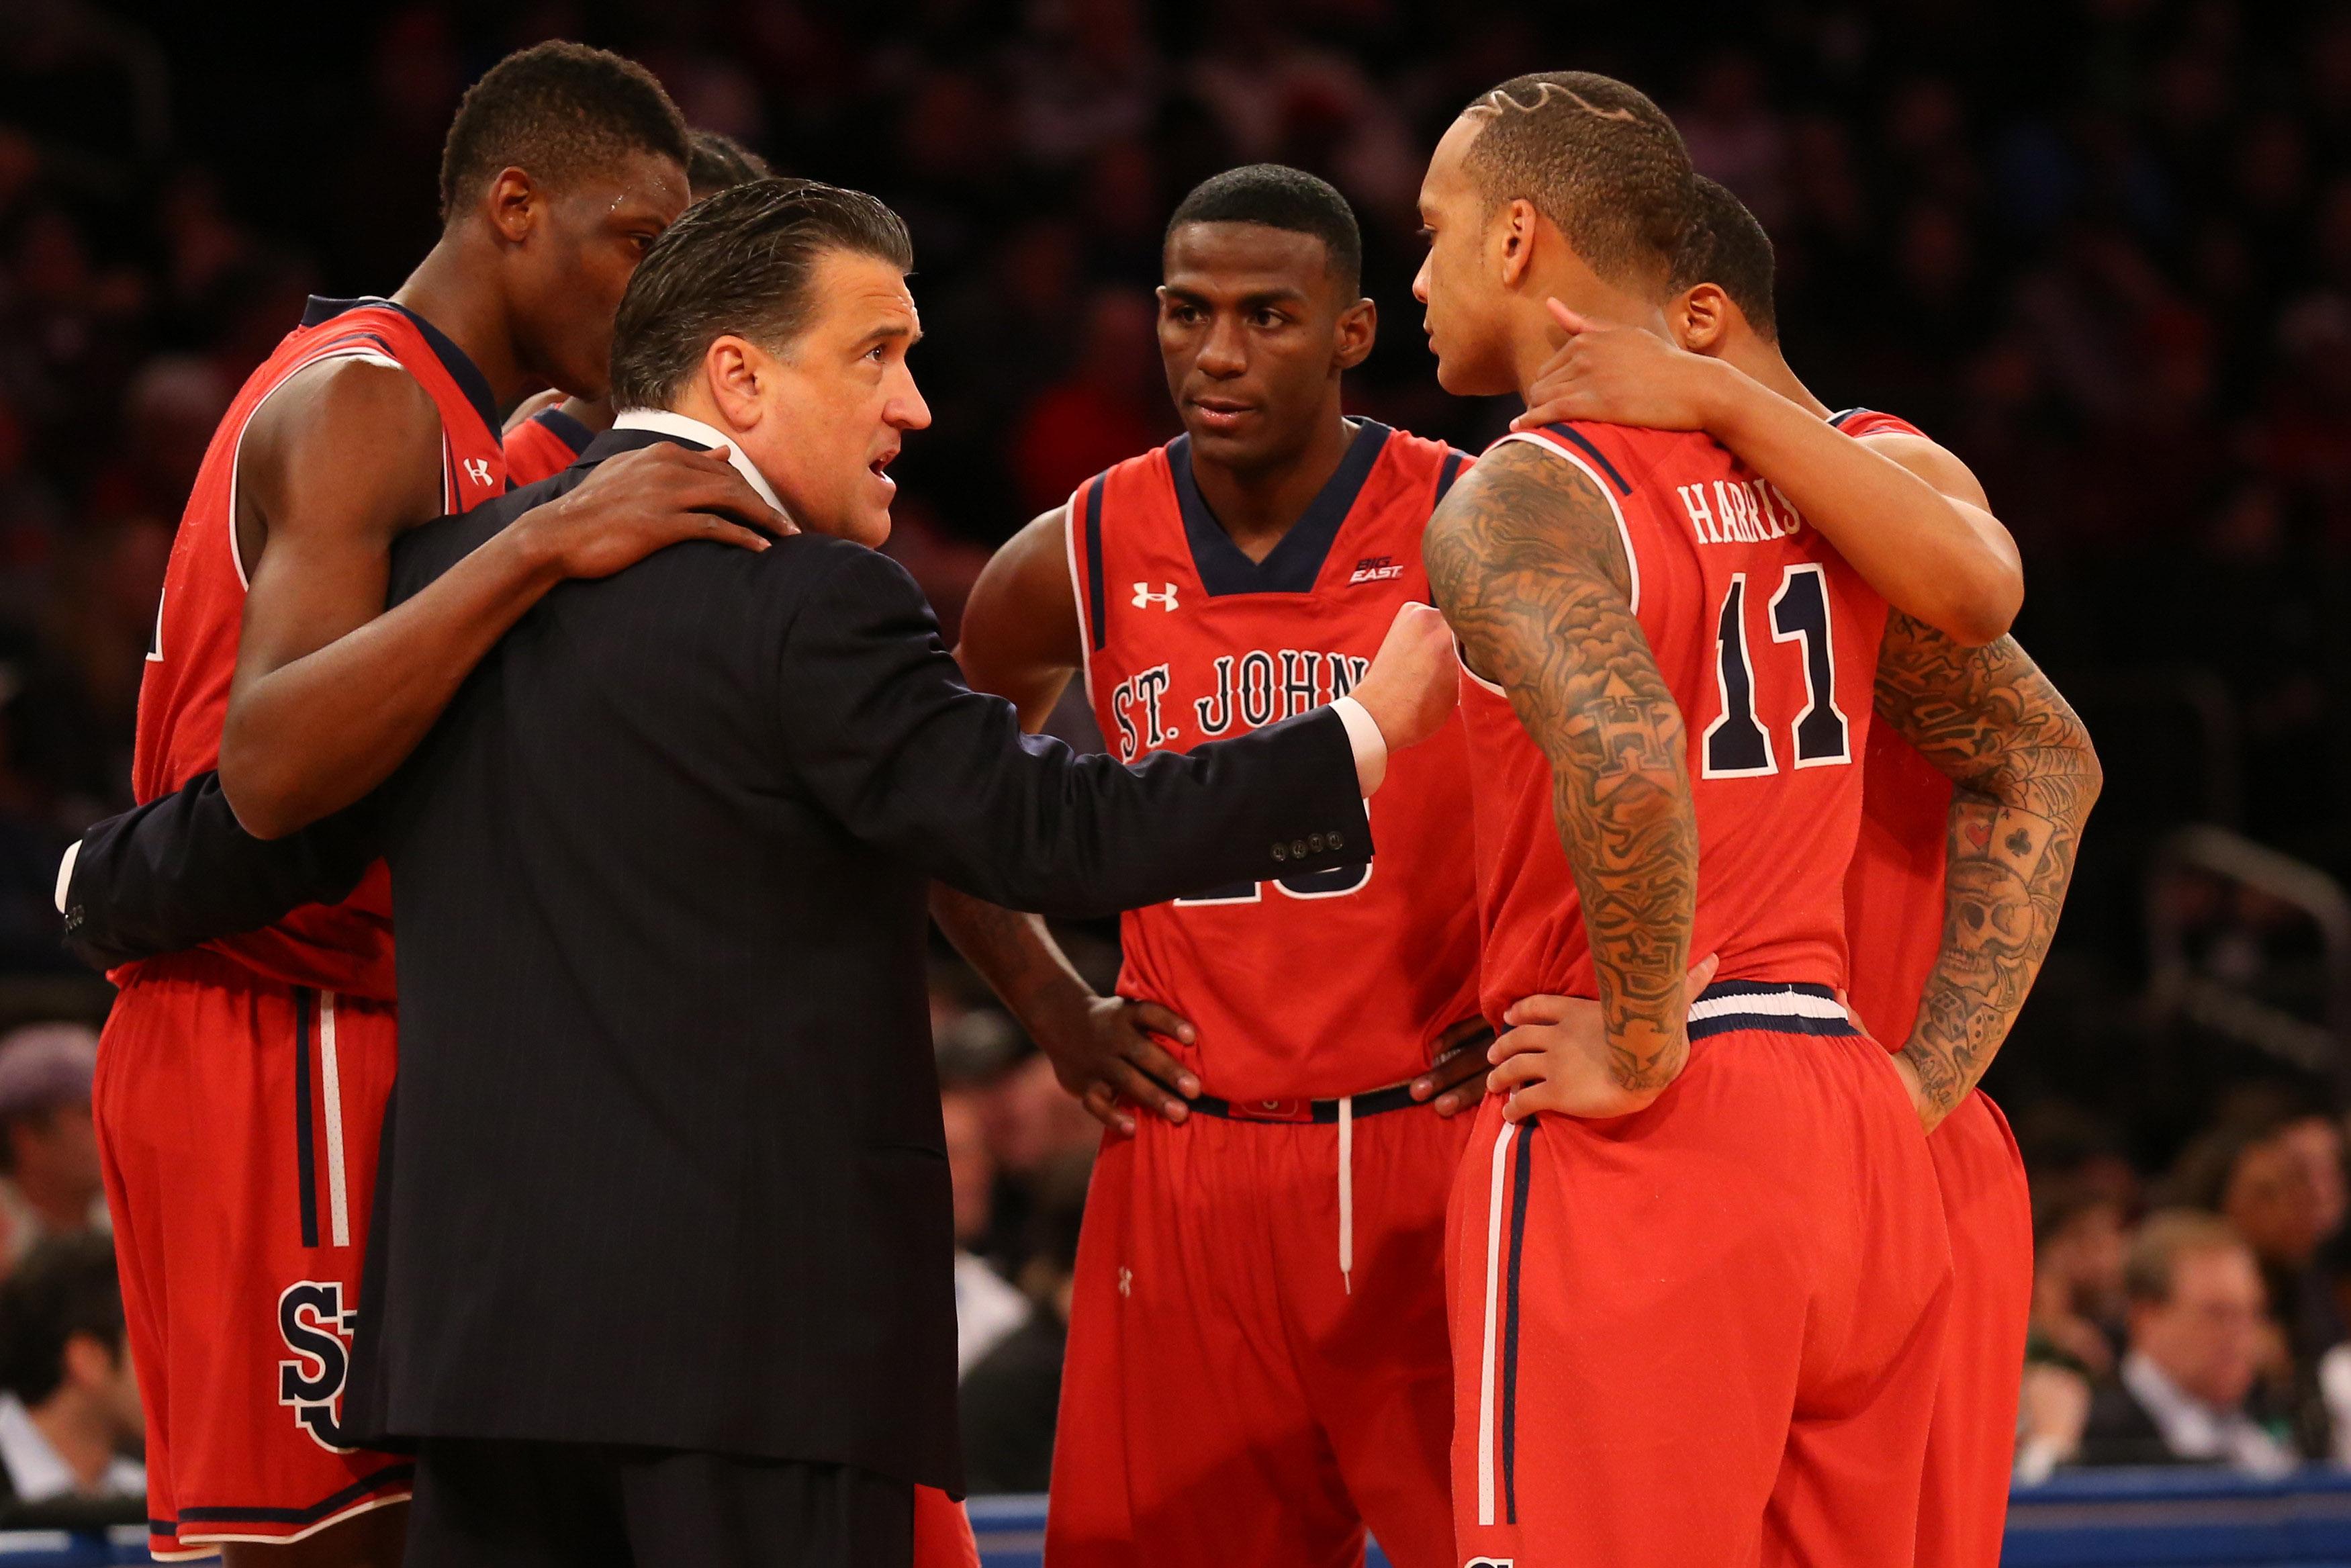 NCAA Basketball: Providence at St. John's